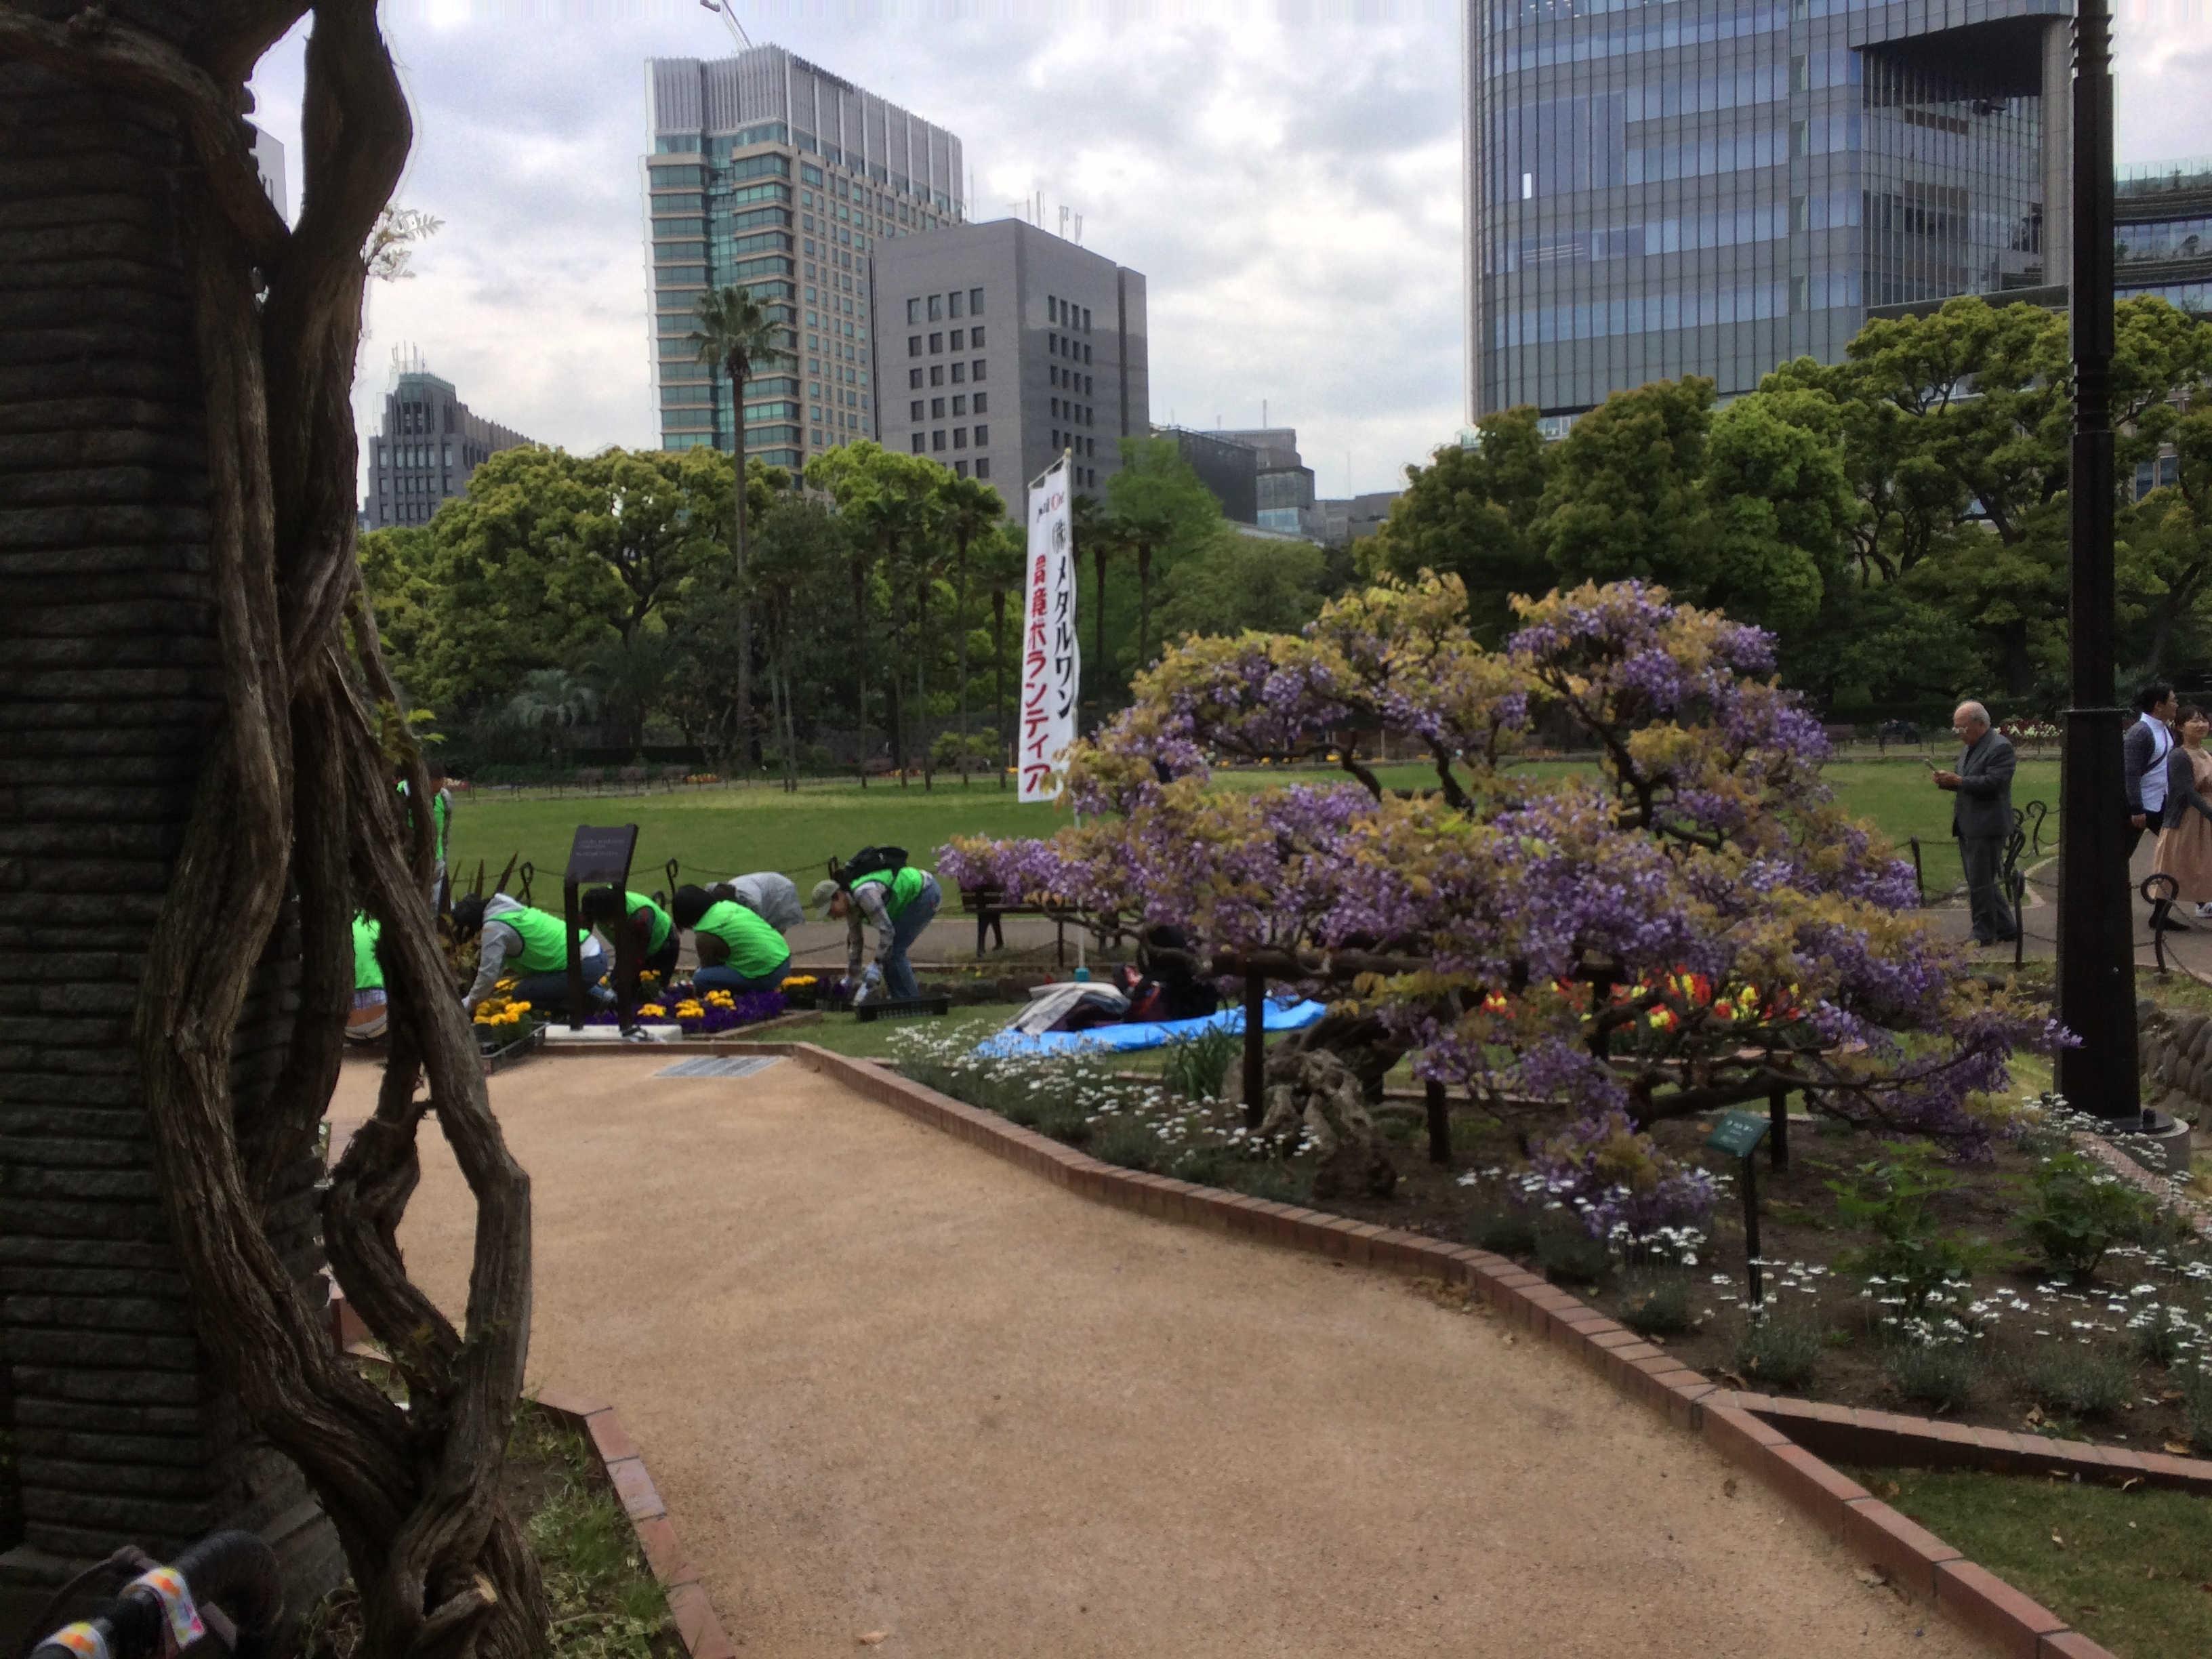 日比谷公園健康運動広場(スタート)